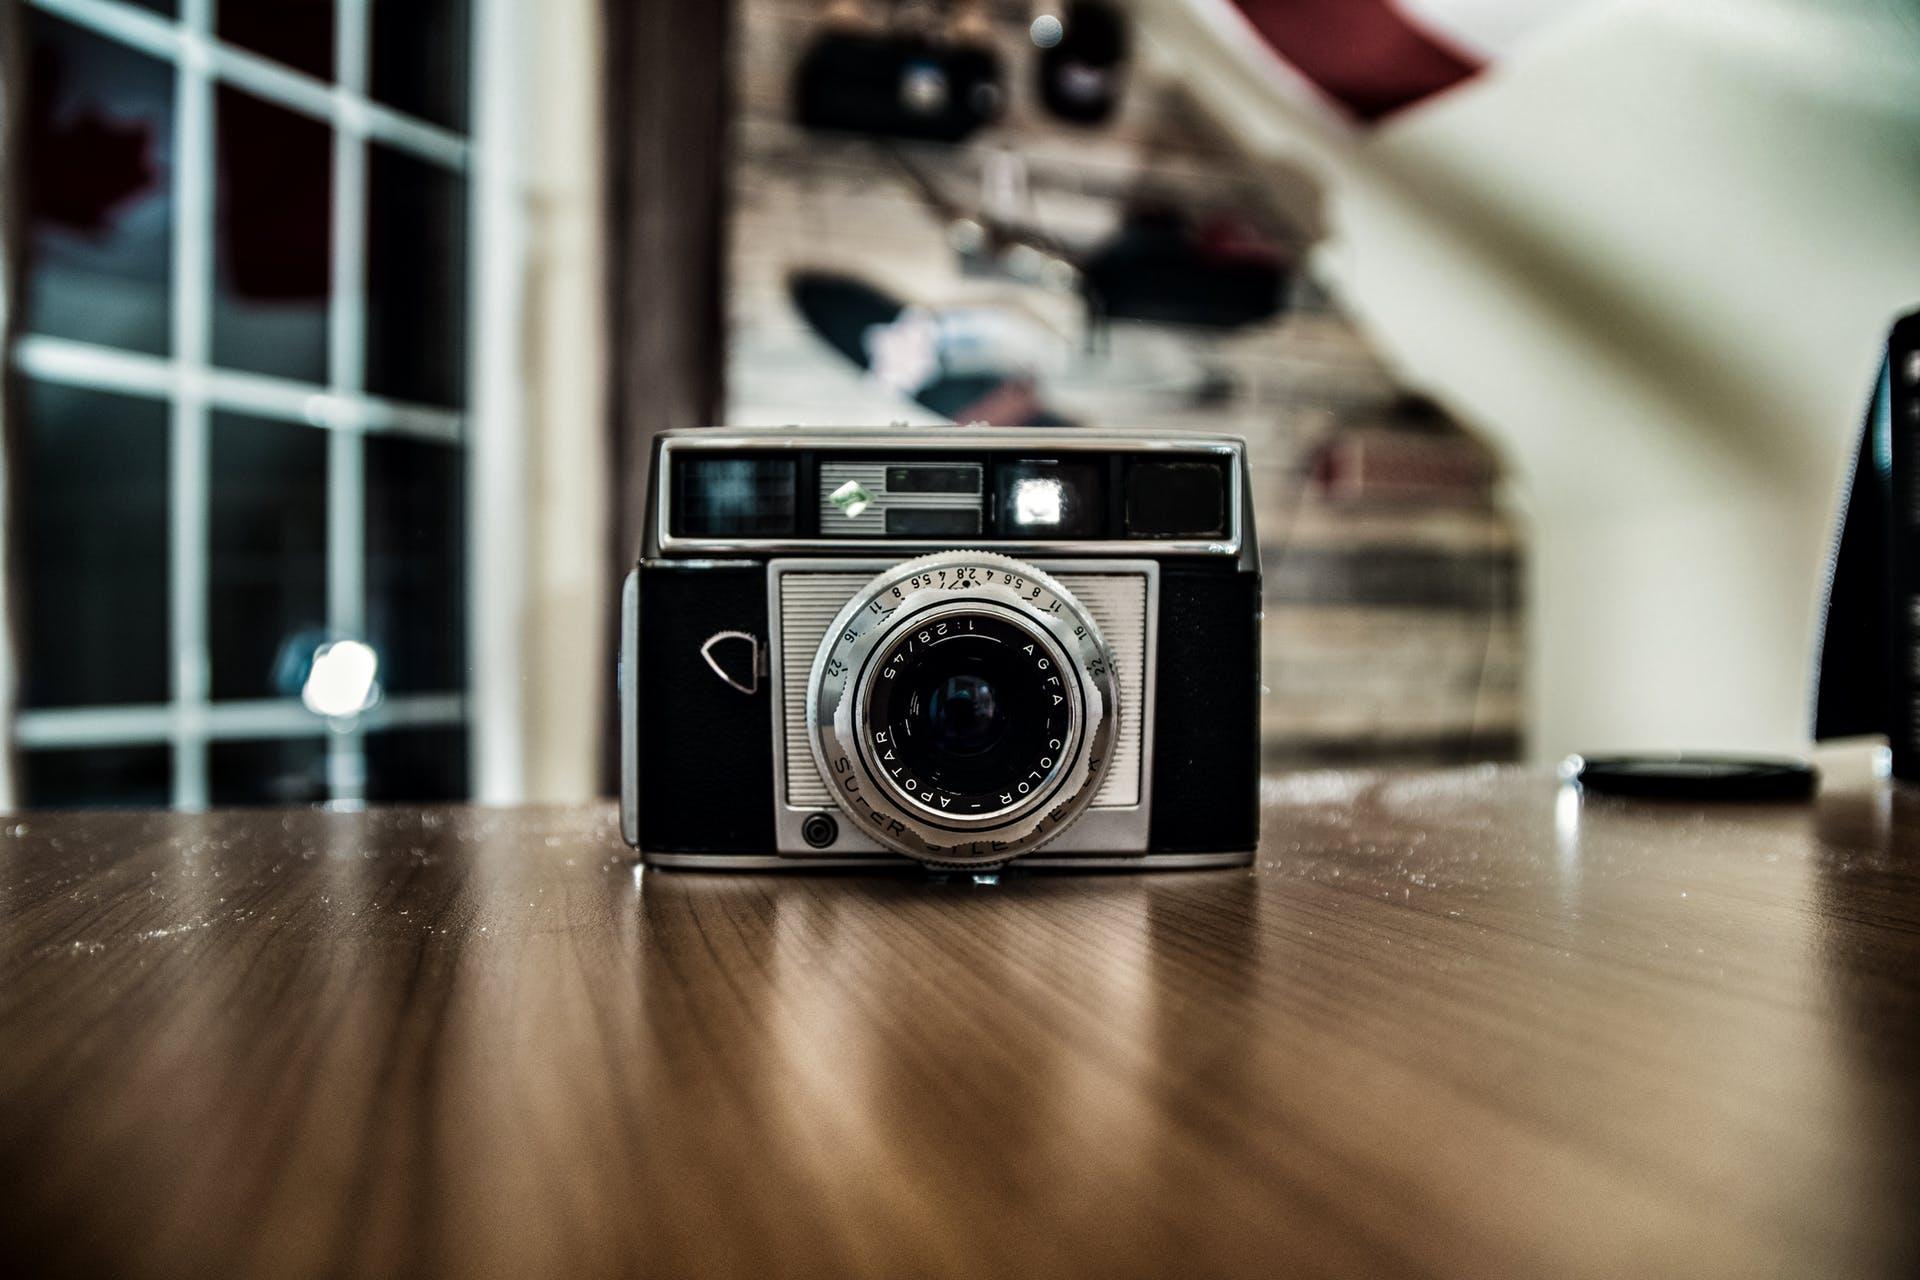 equipment camera close-up indoors studio blur blurred background lens technology old camera